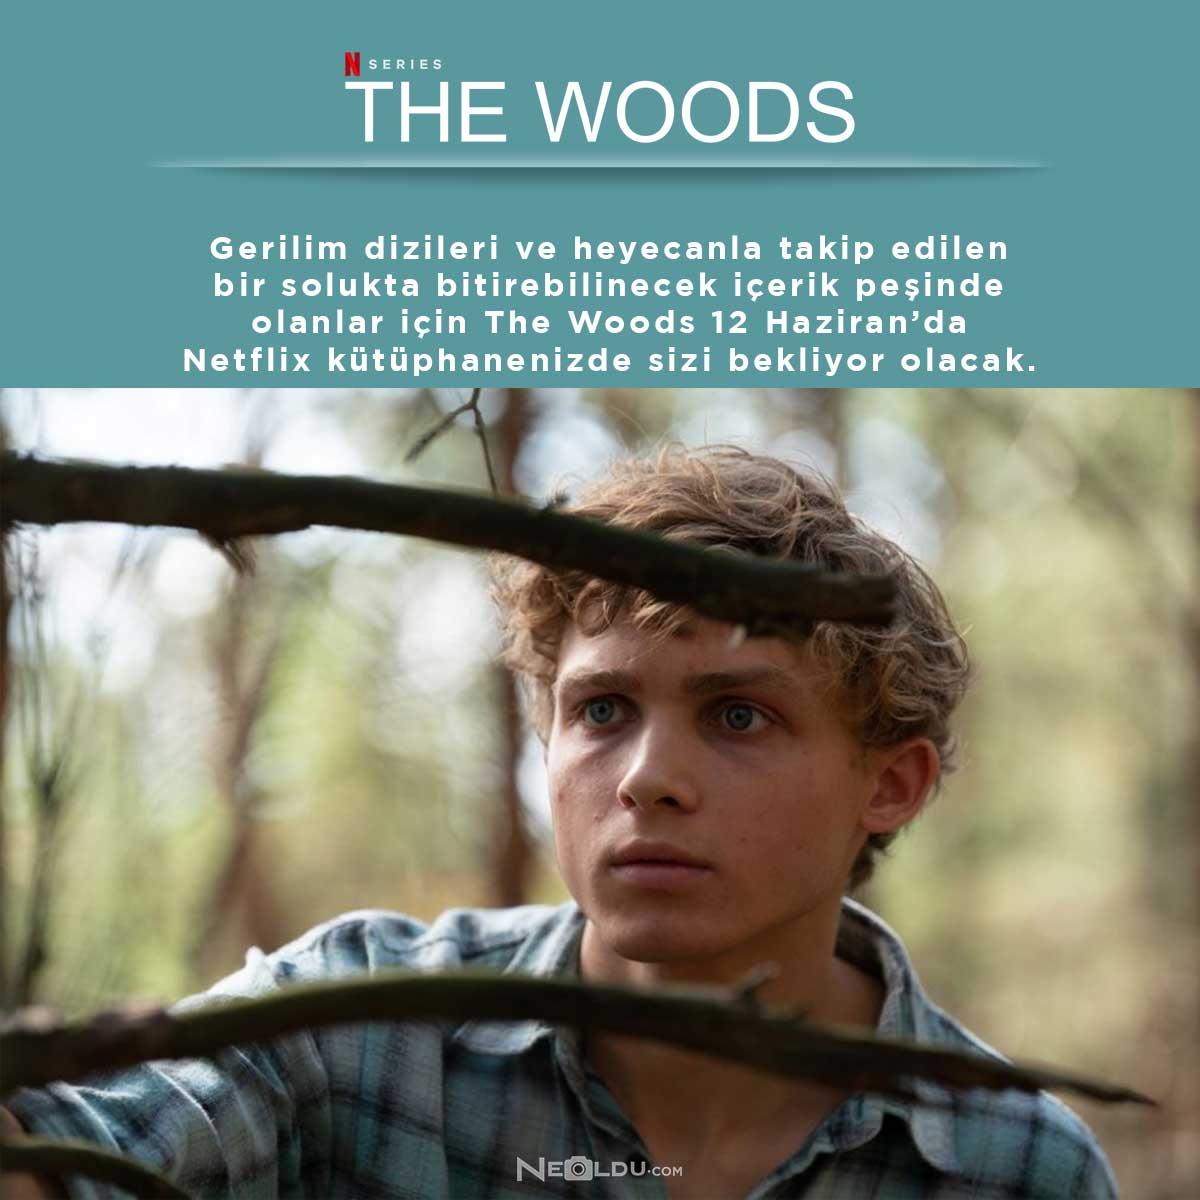 yeni-netflix-dizisi-the-woods.jpg